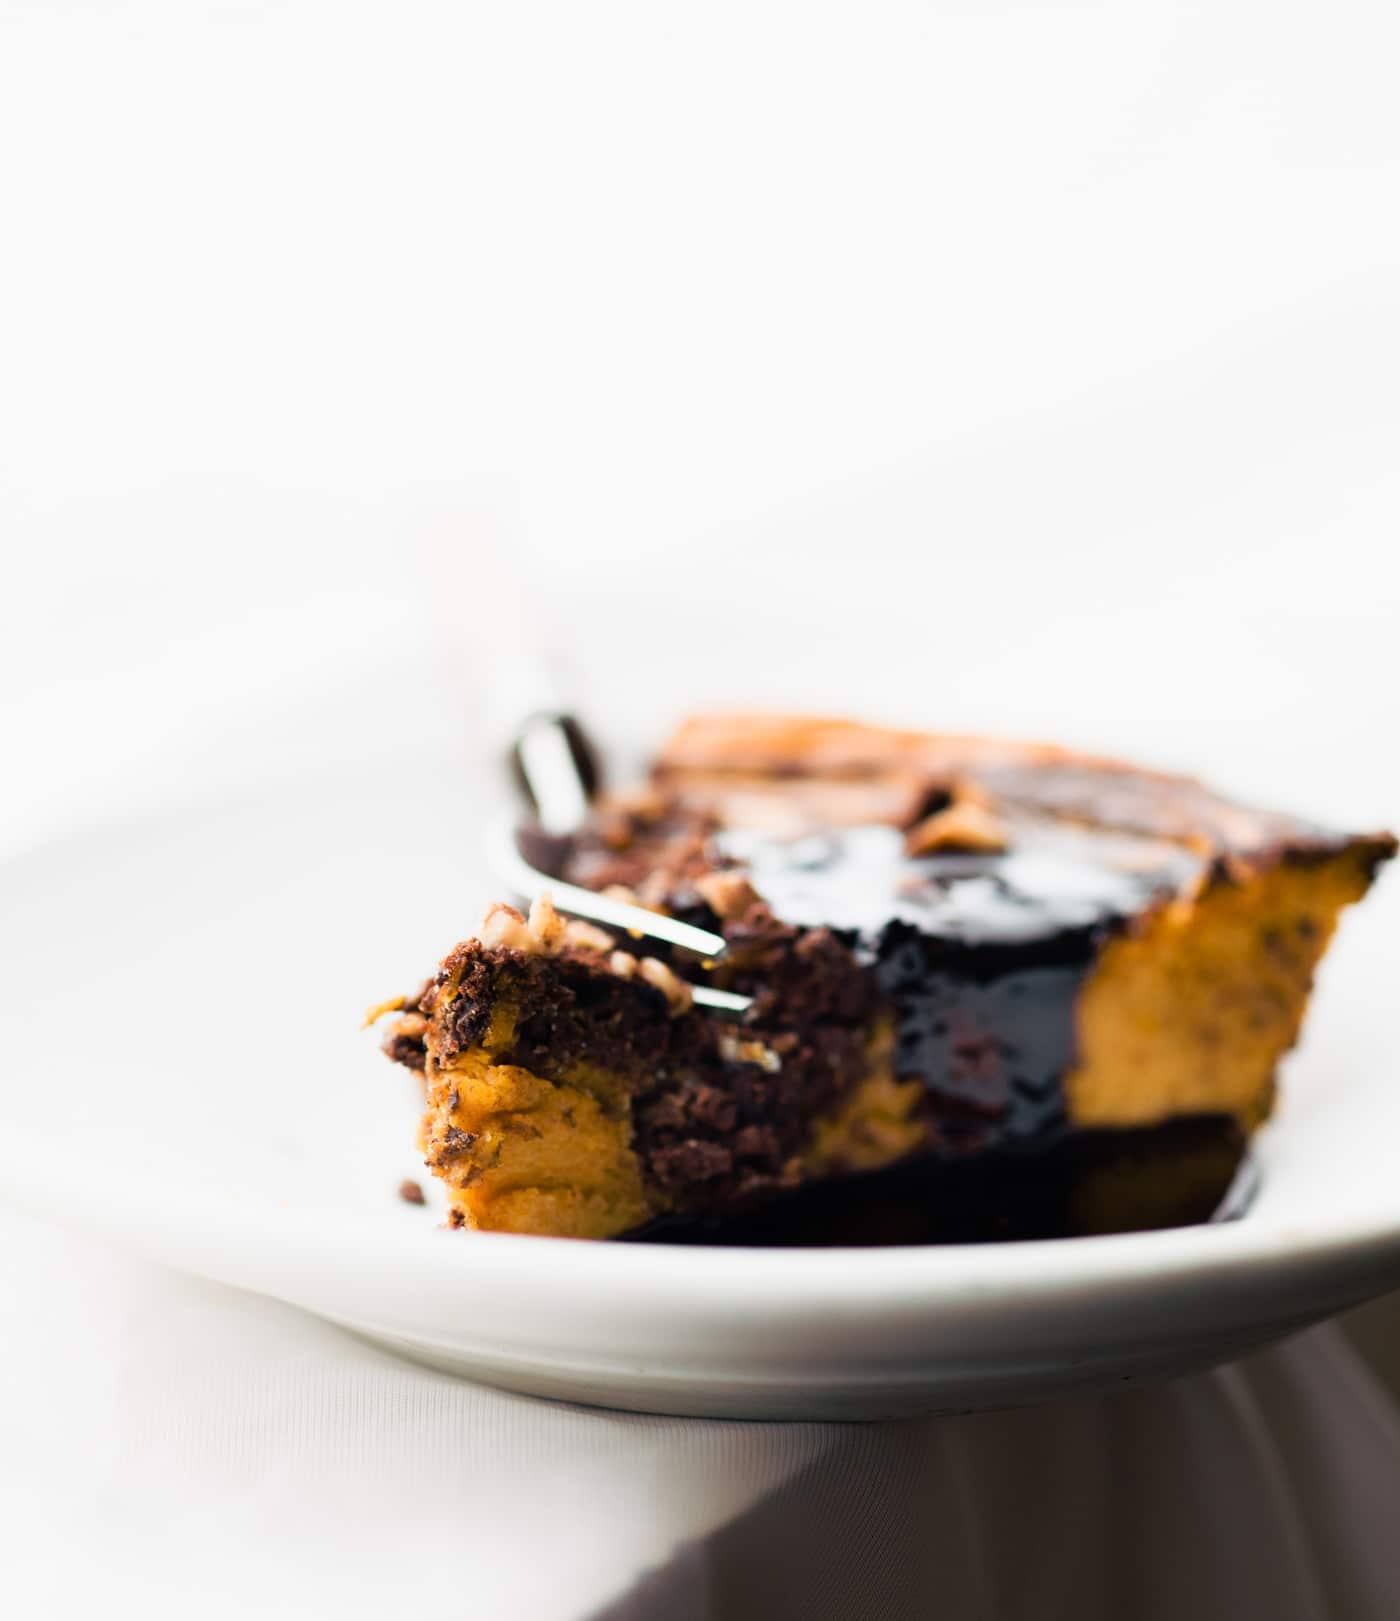 Crustless Pumpkin Pie Recipe With Cake Mix